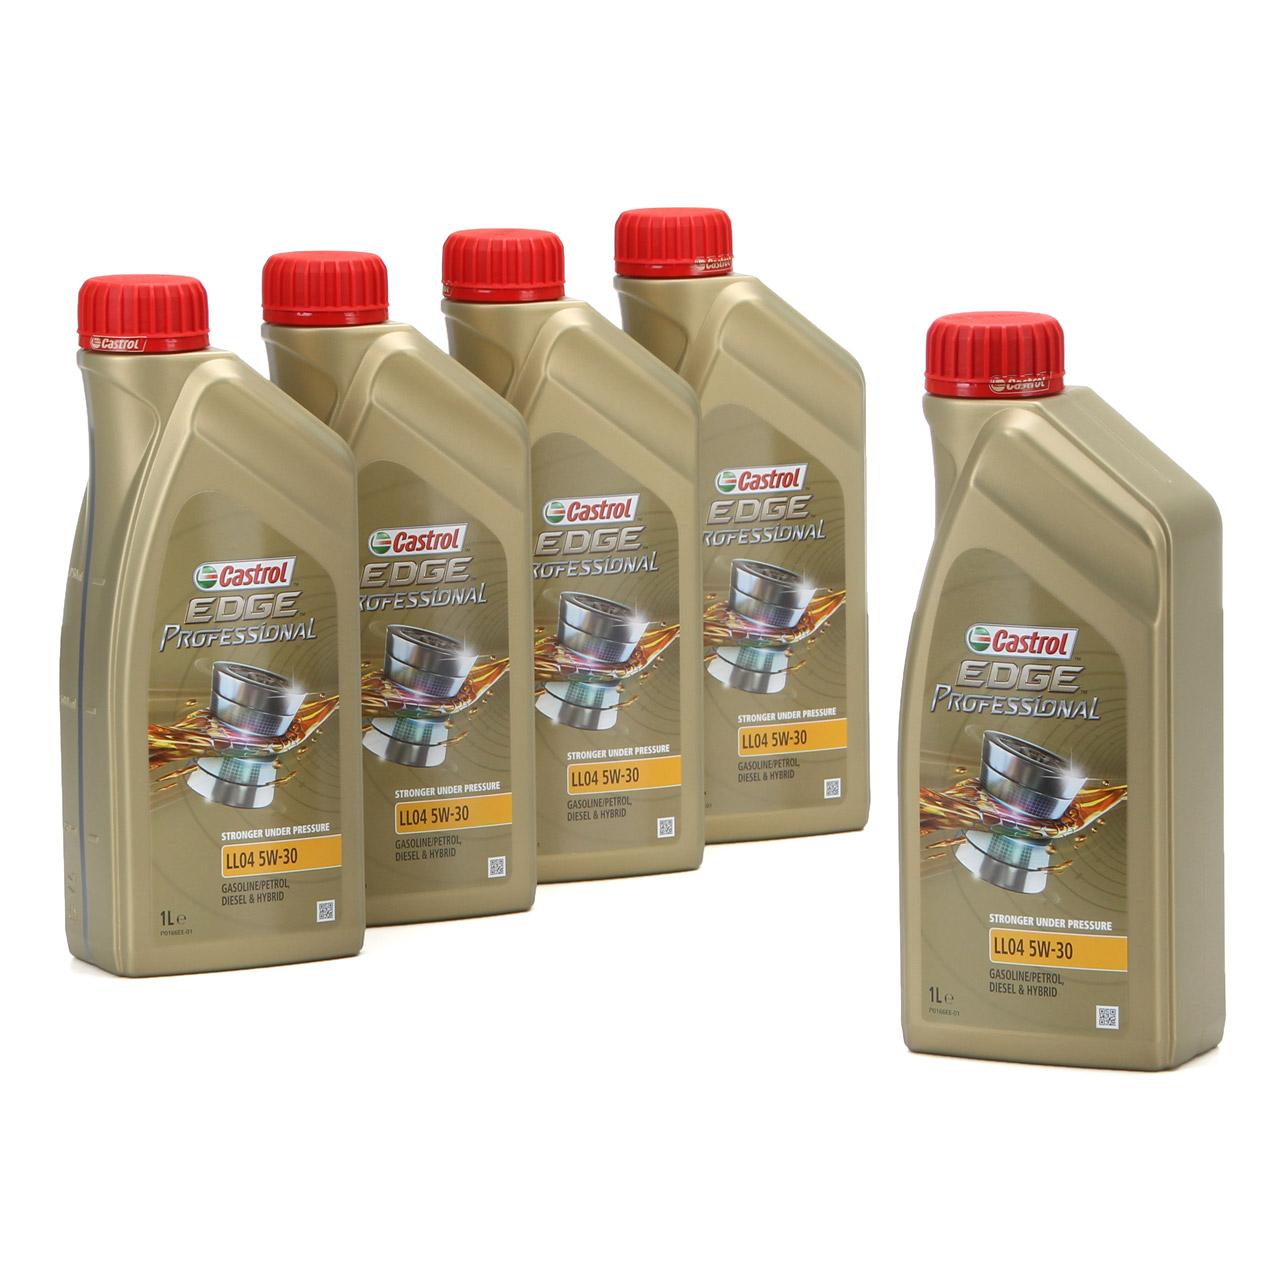 CASTROL EDGE Professional Motoröl Öl für BMW Longlife IV LL04 5W-30 - 5 Liter